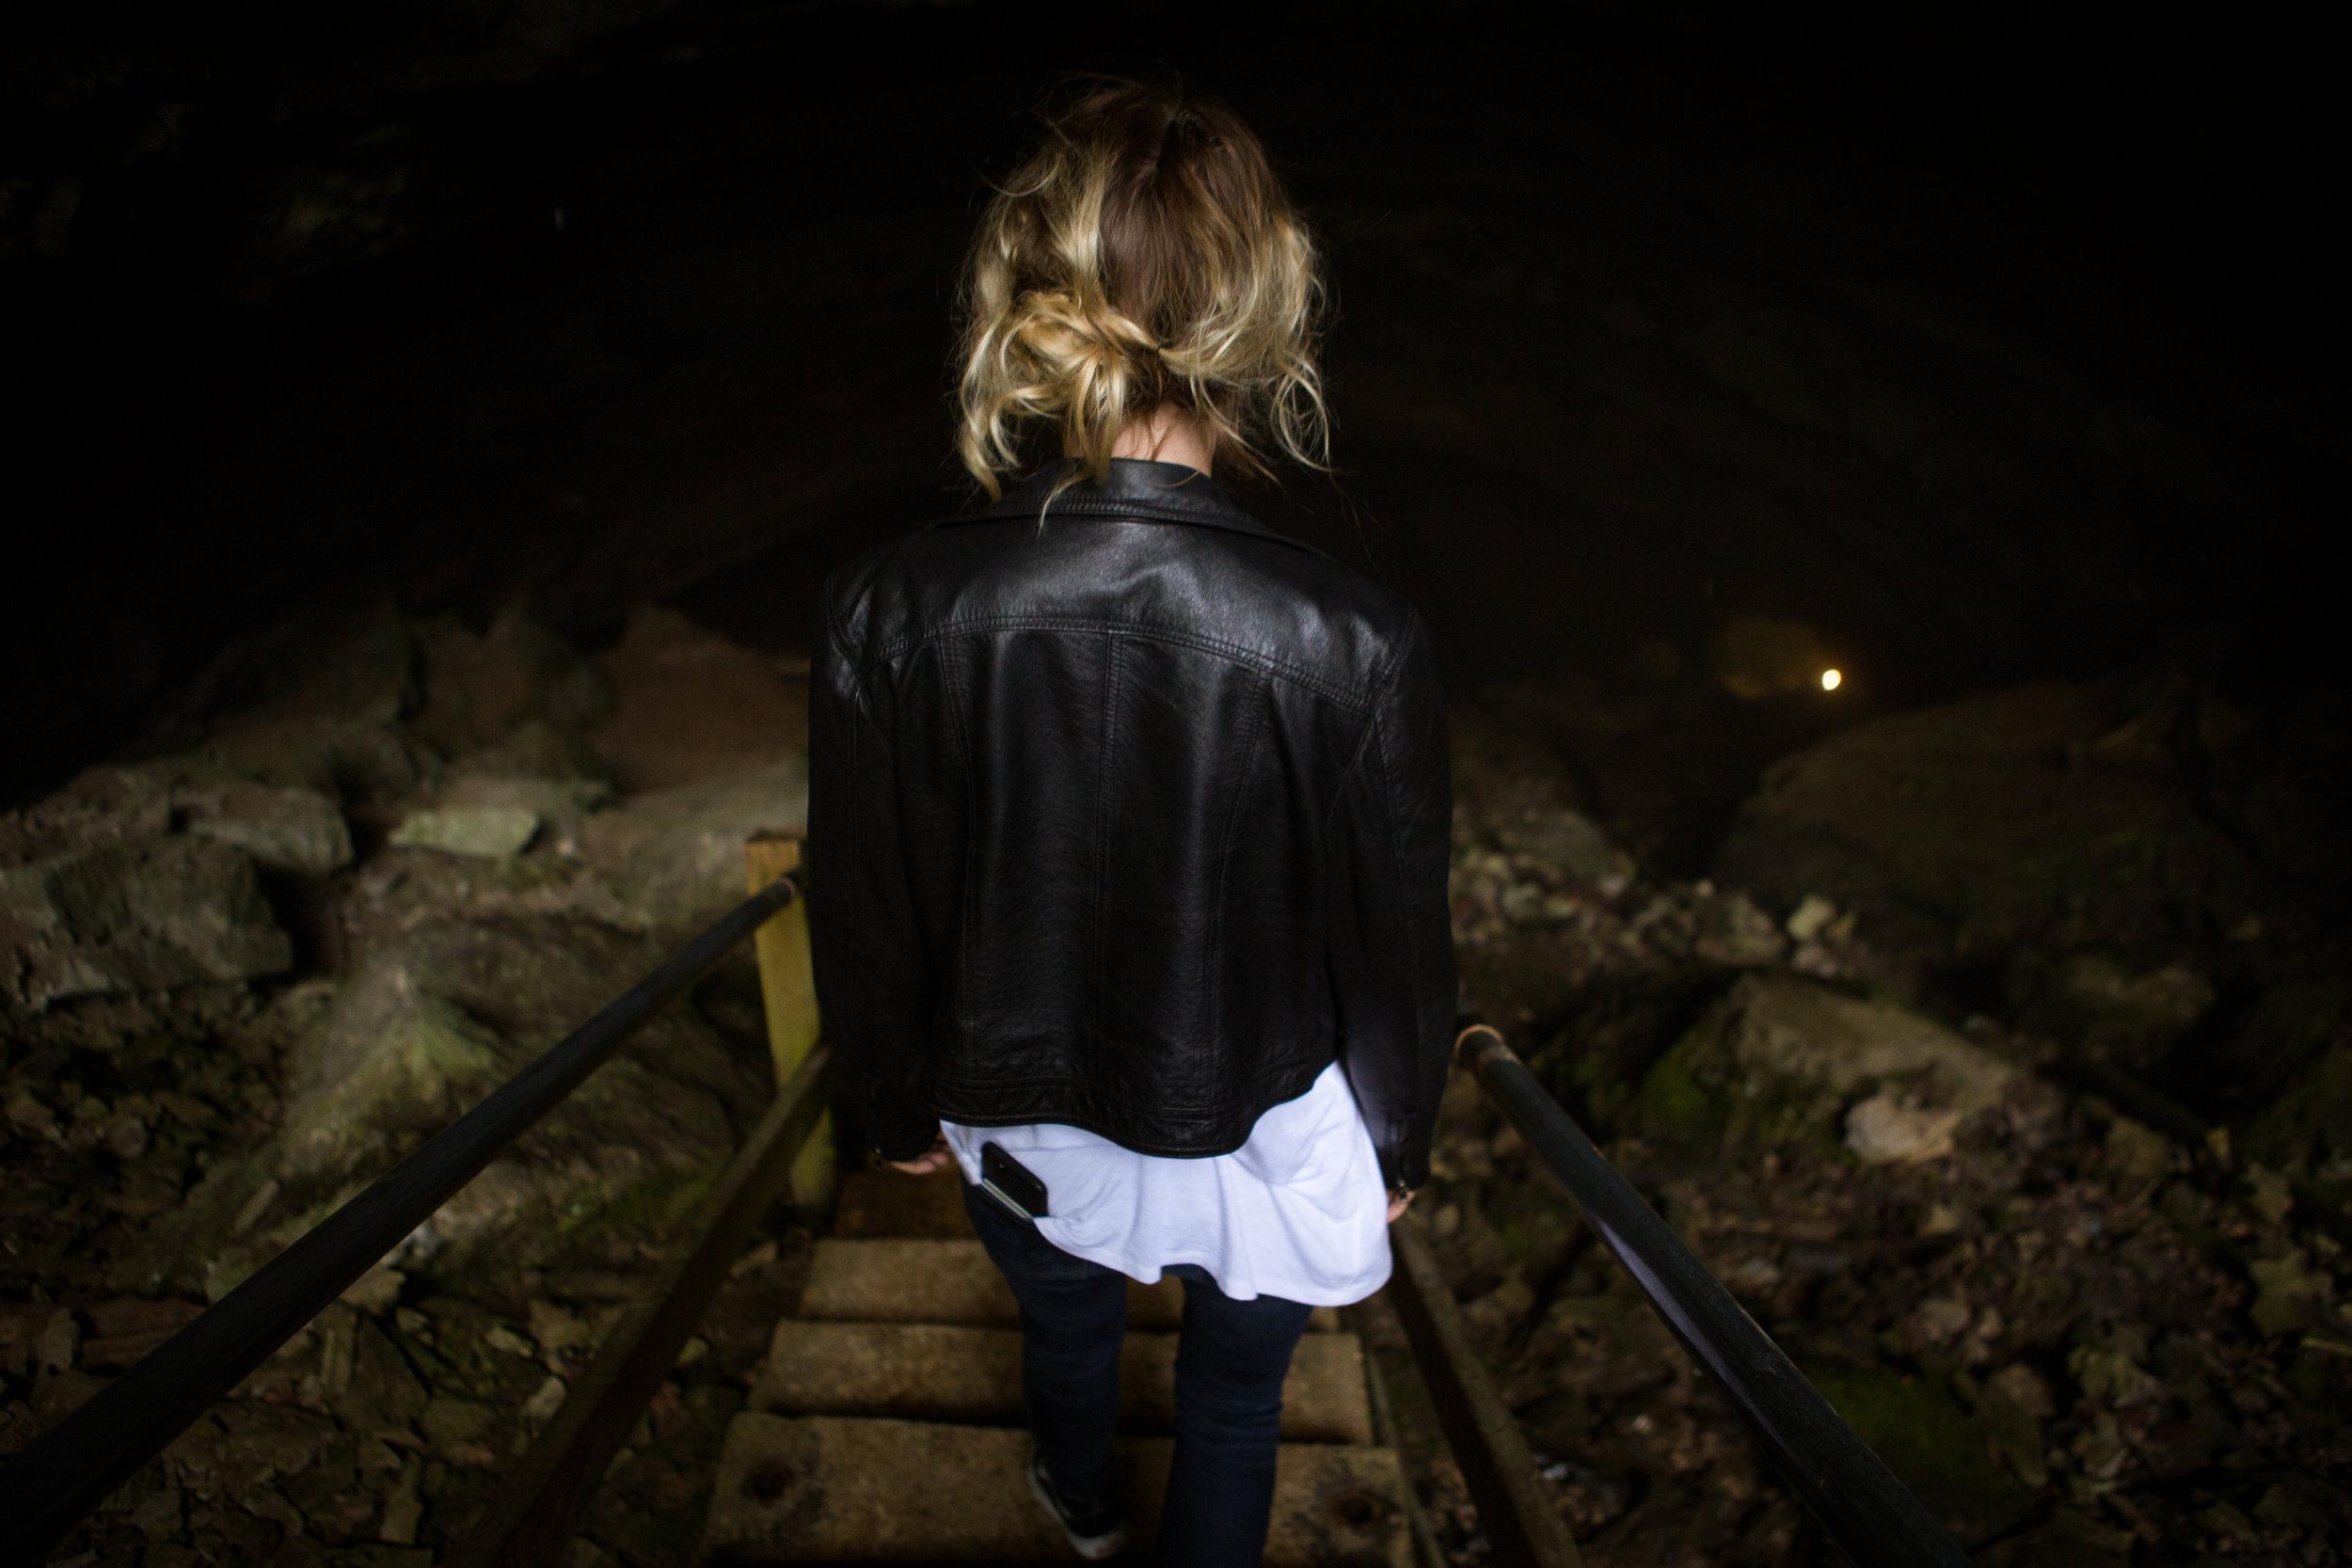 Hidden River Cave Kentucky Leticia Cline shot by Preston Burroughs